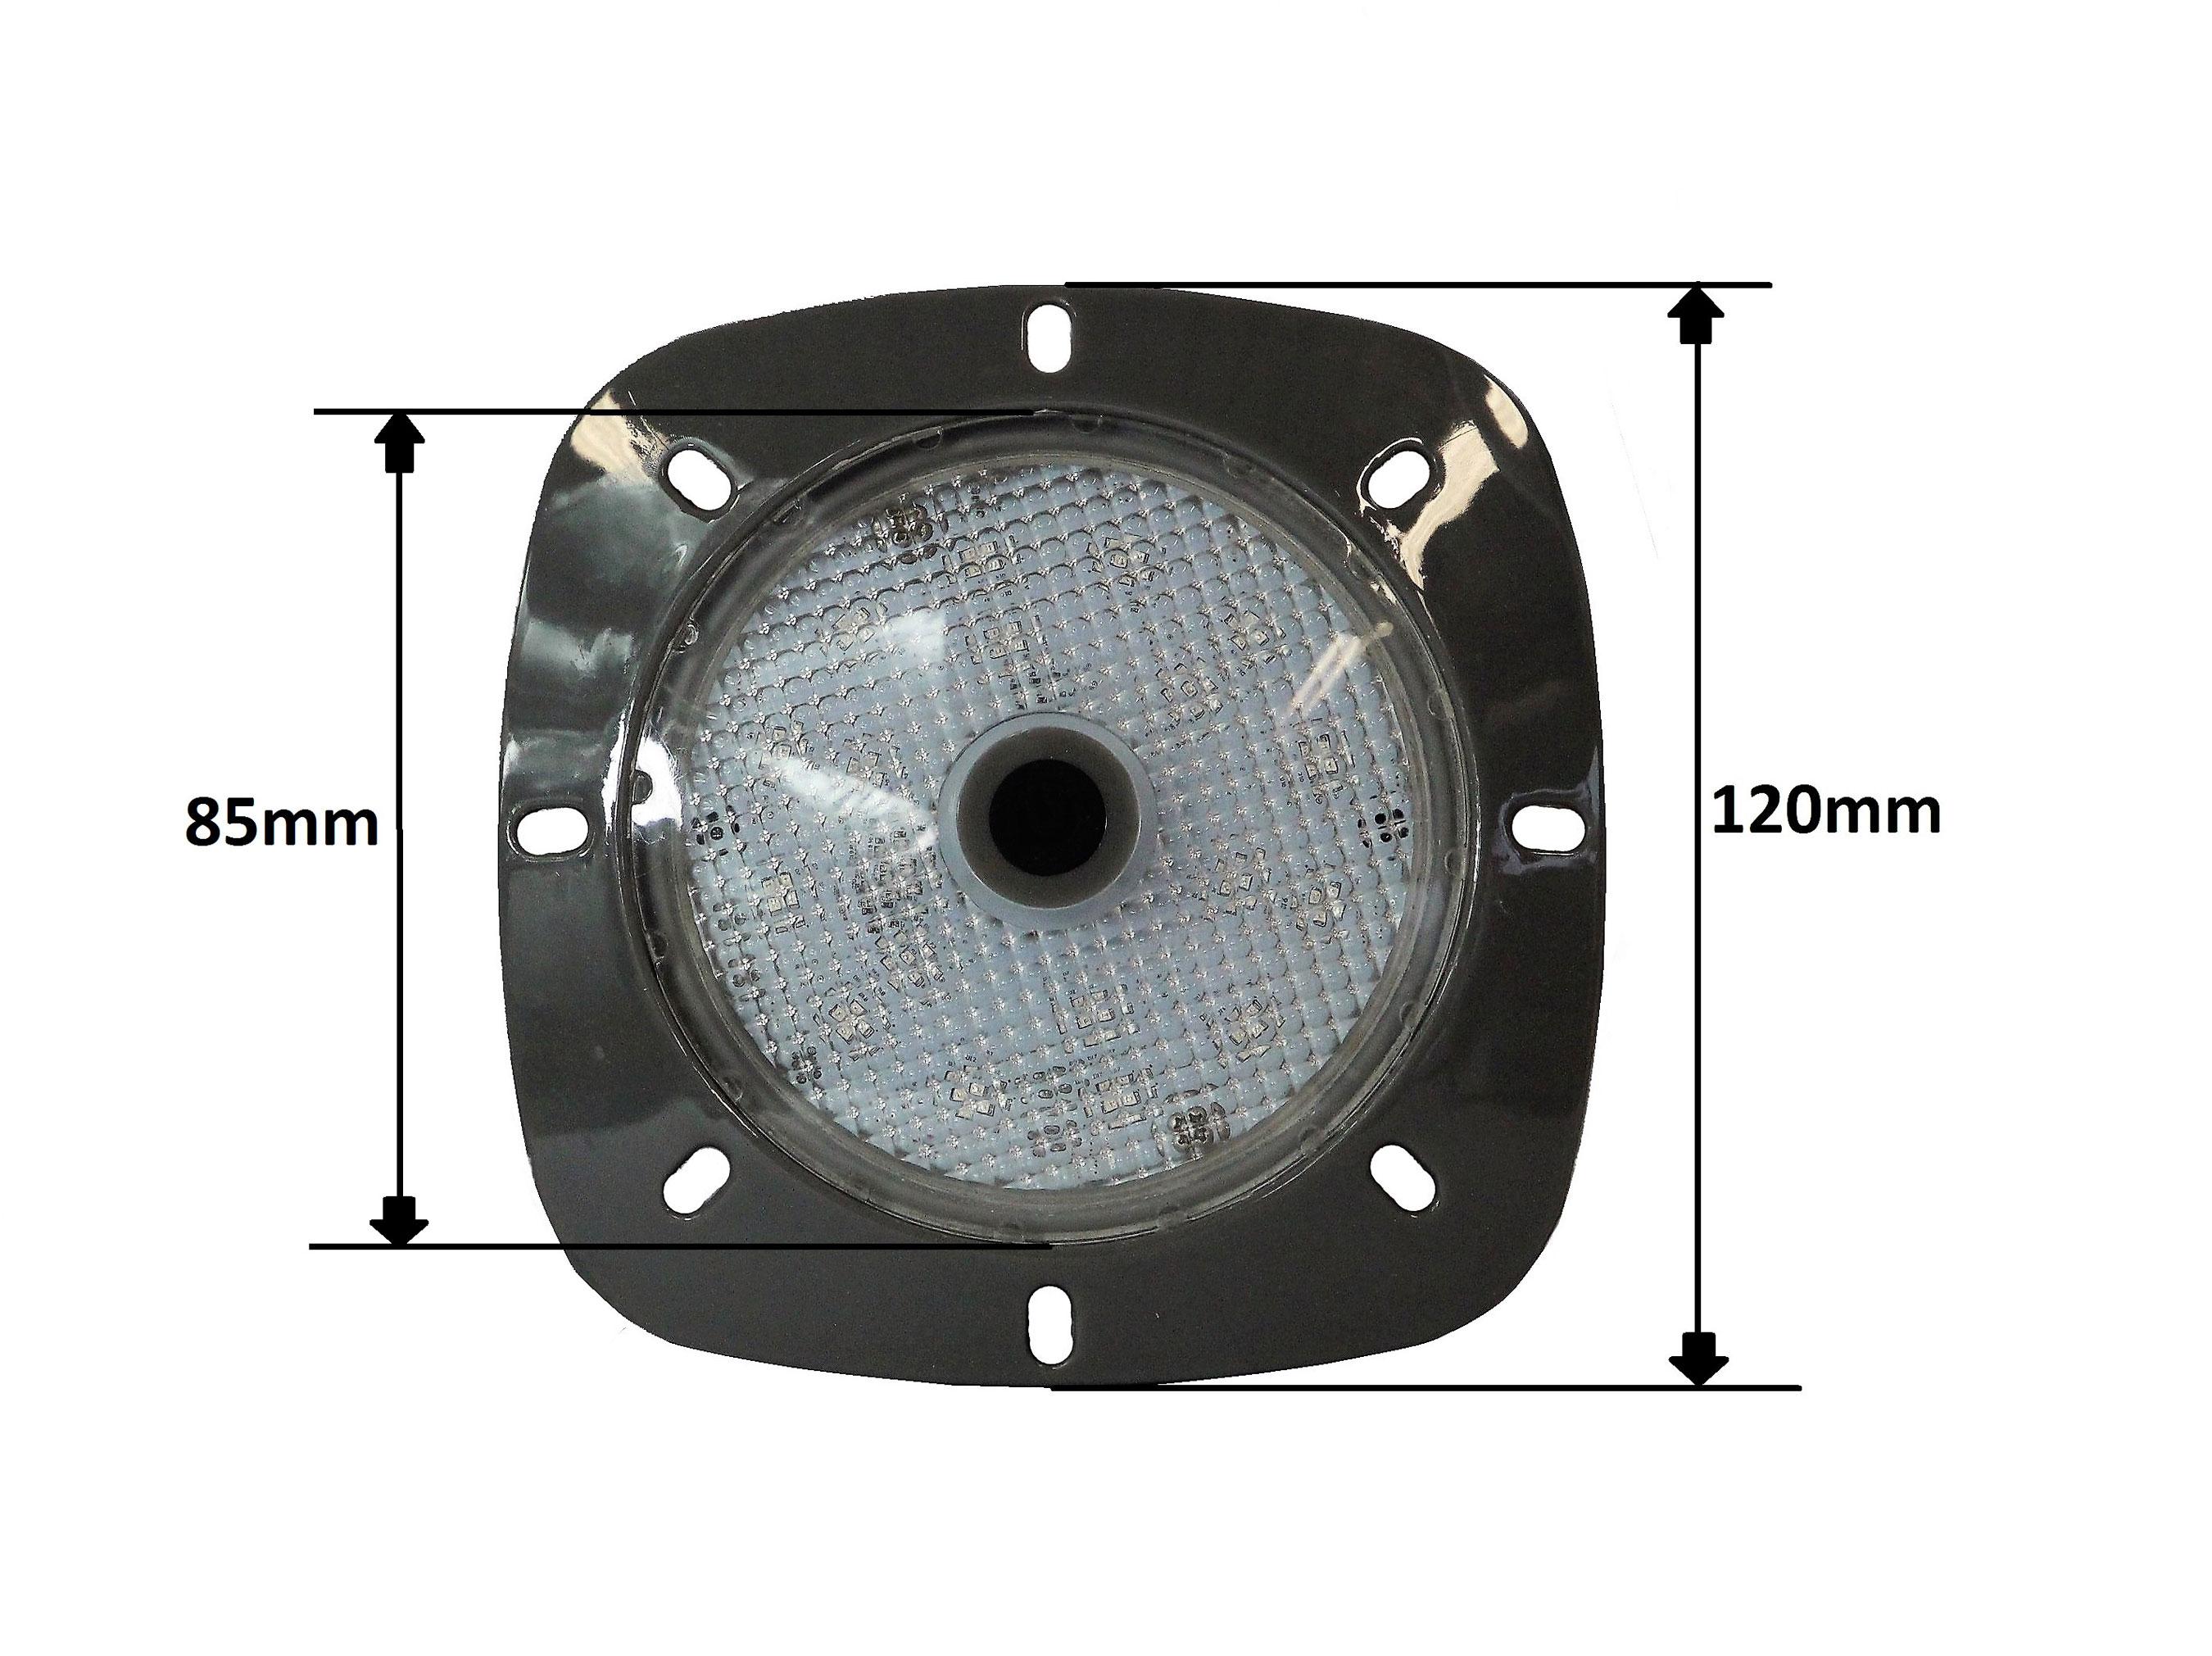 Poolbeleuchtung LED myPool LED-Magnet-Scheinwerfer weiß/RGB Bild 2